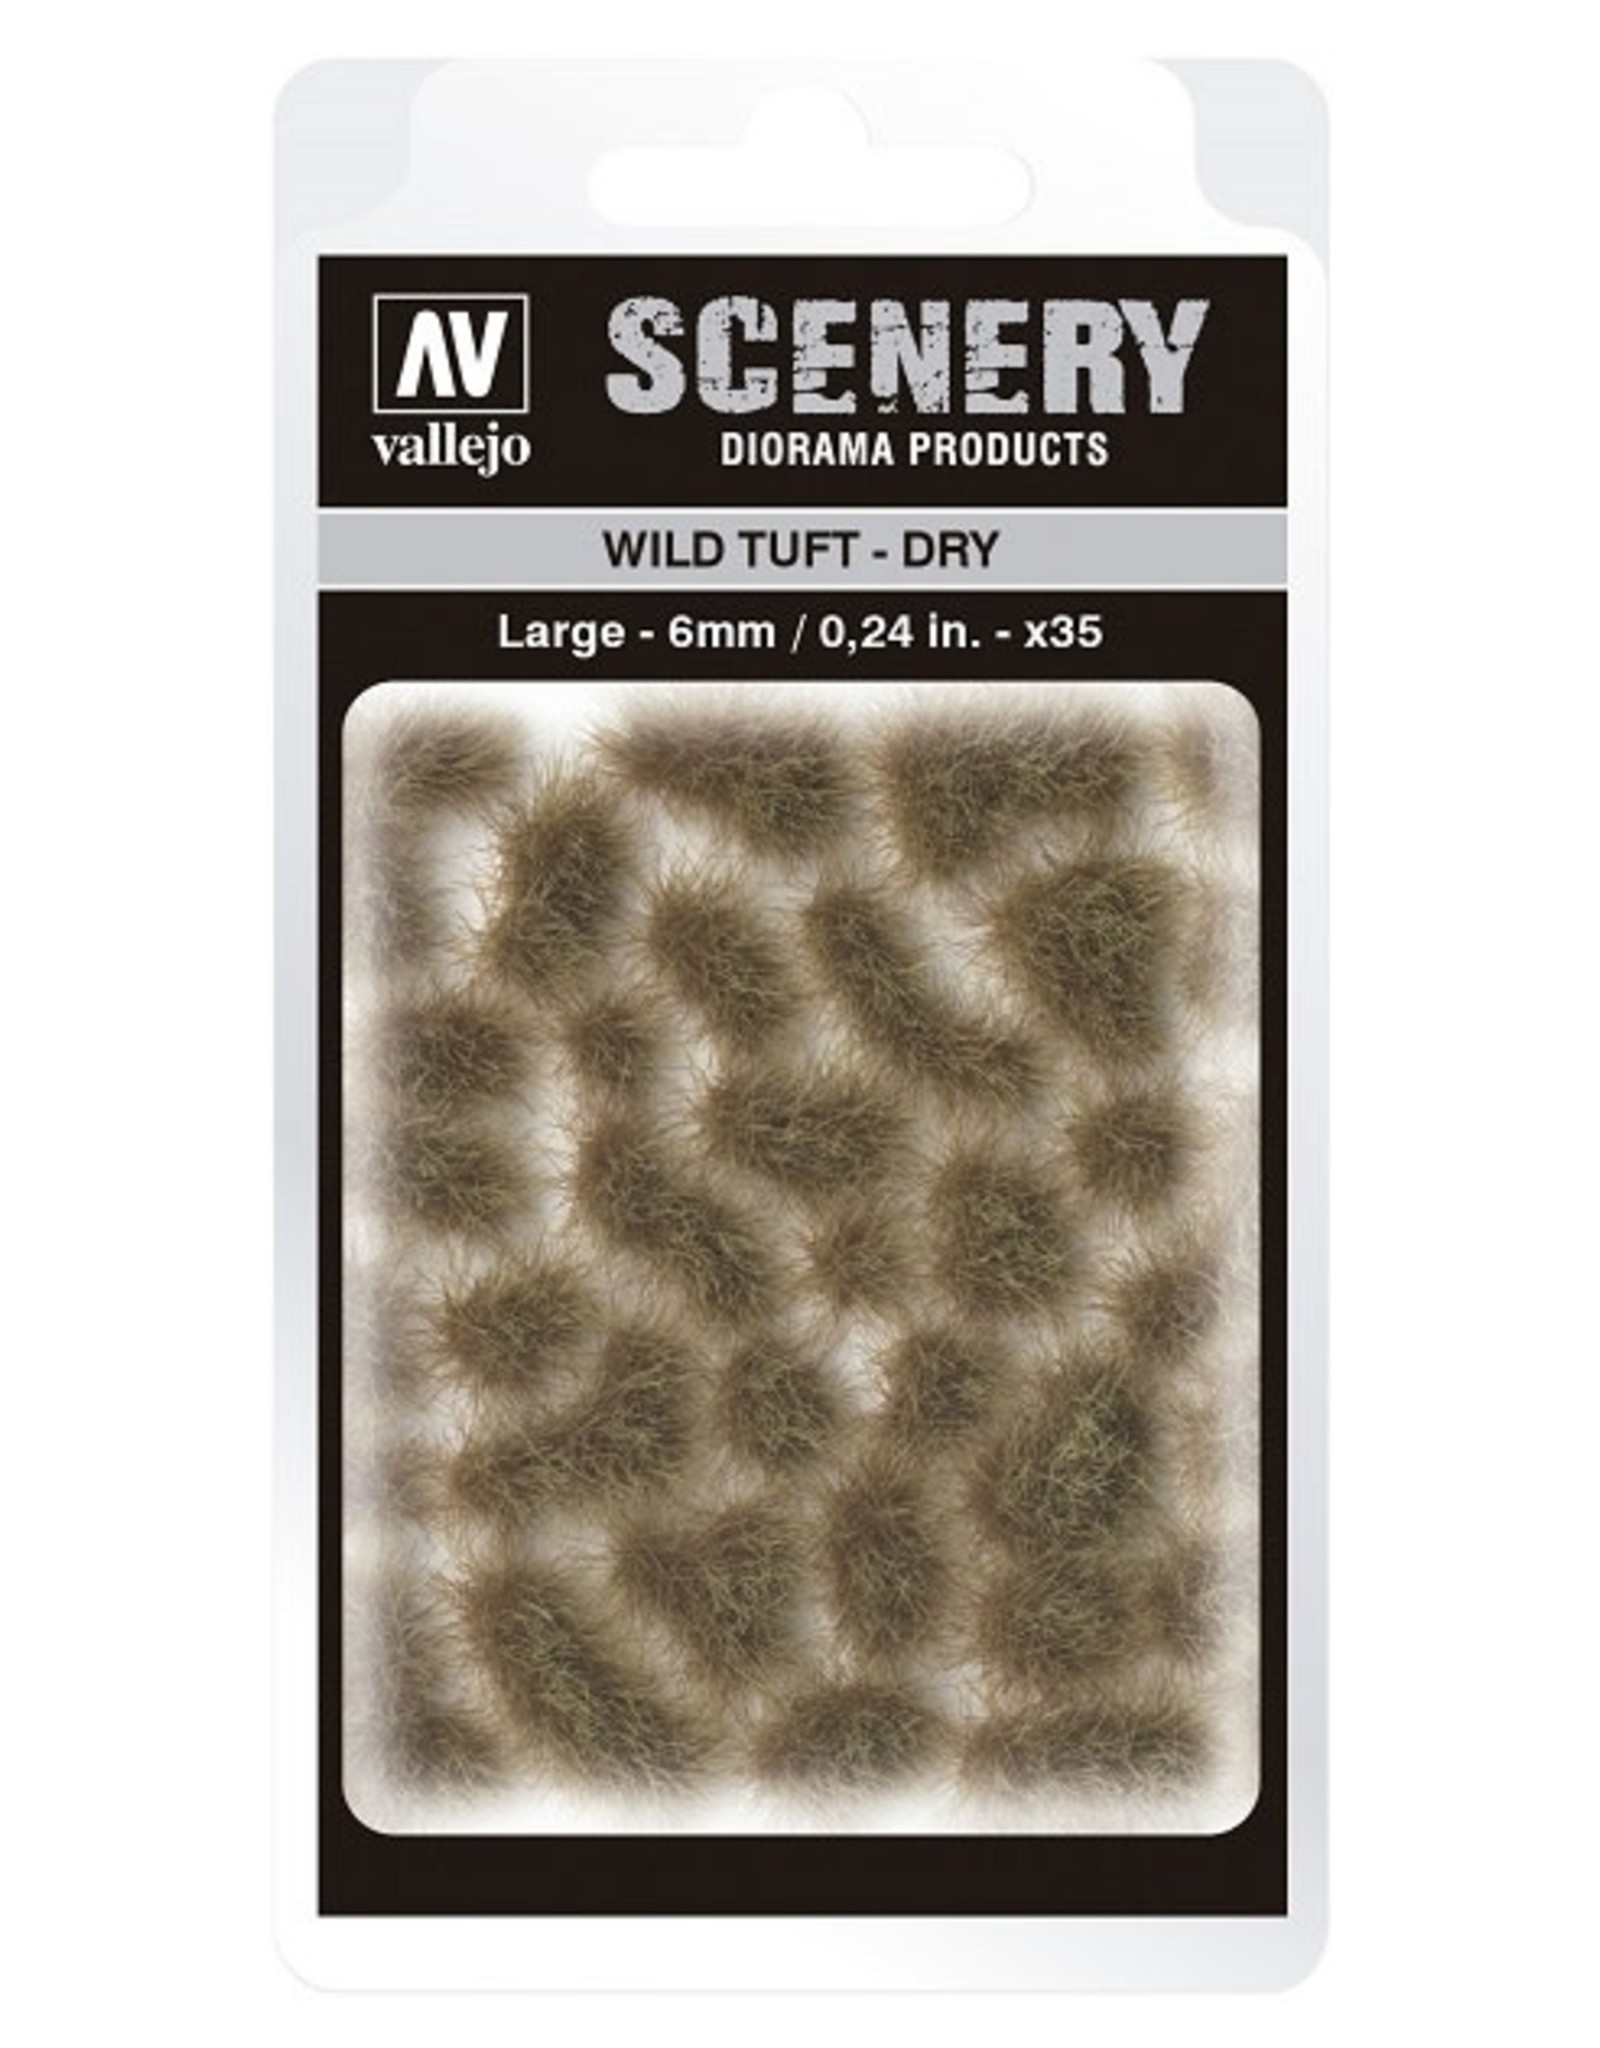 Vallejo Vallejo: Scenery -  Wild Tuft - Dry Large 6mm